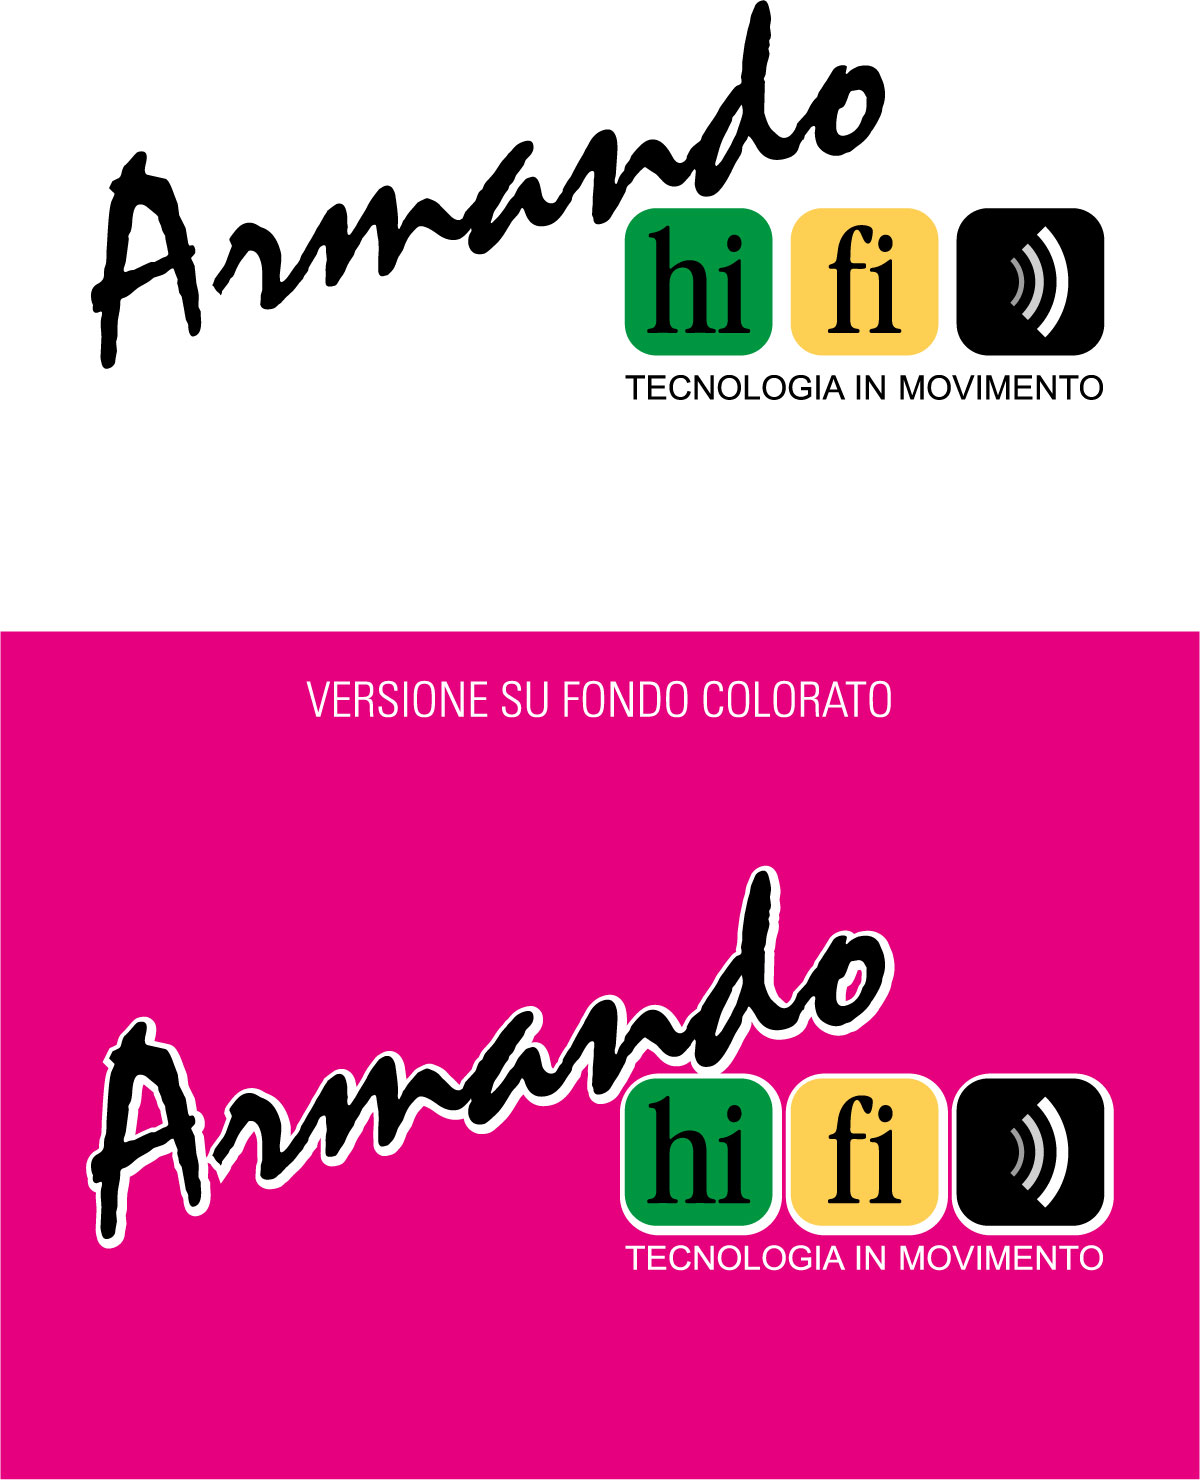 ARMANDO-HIFI